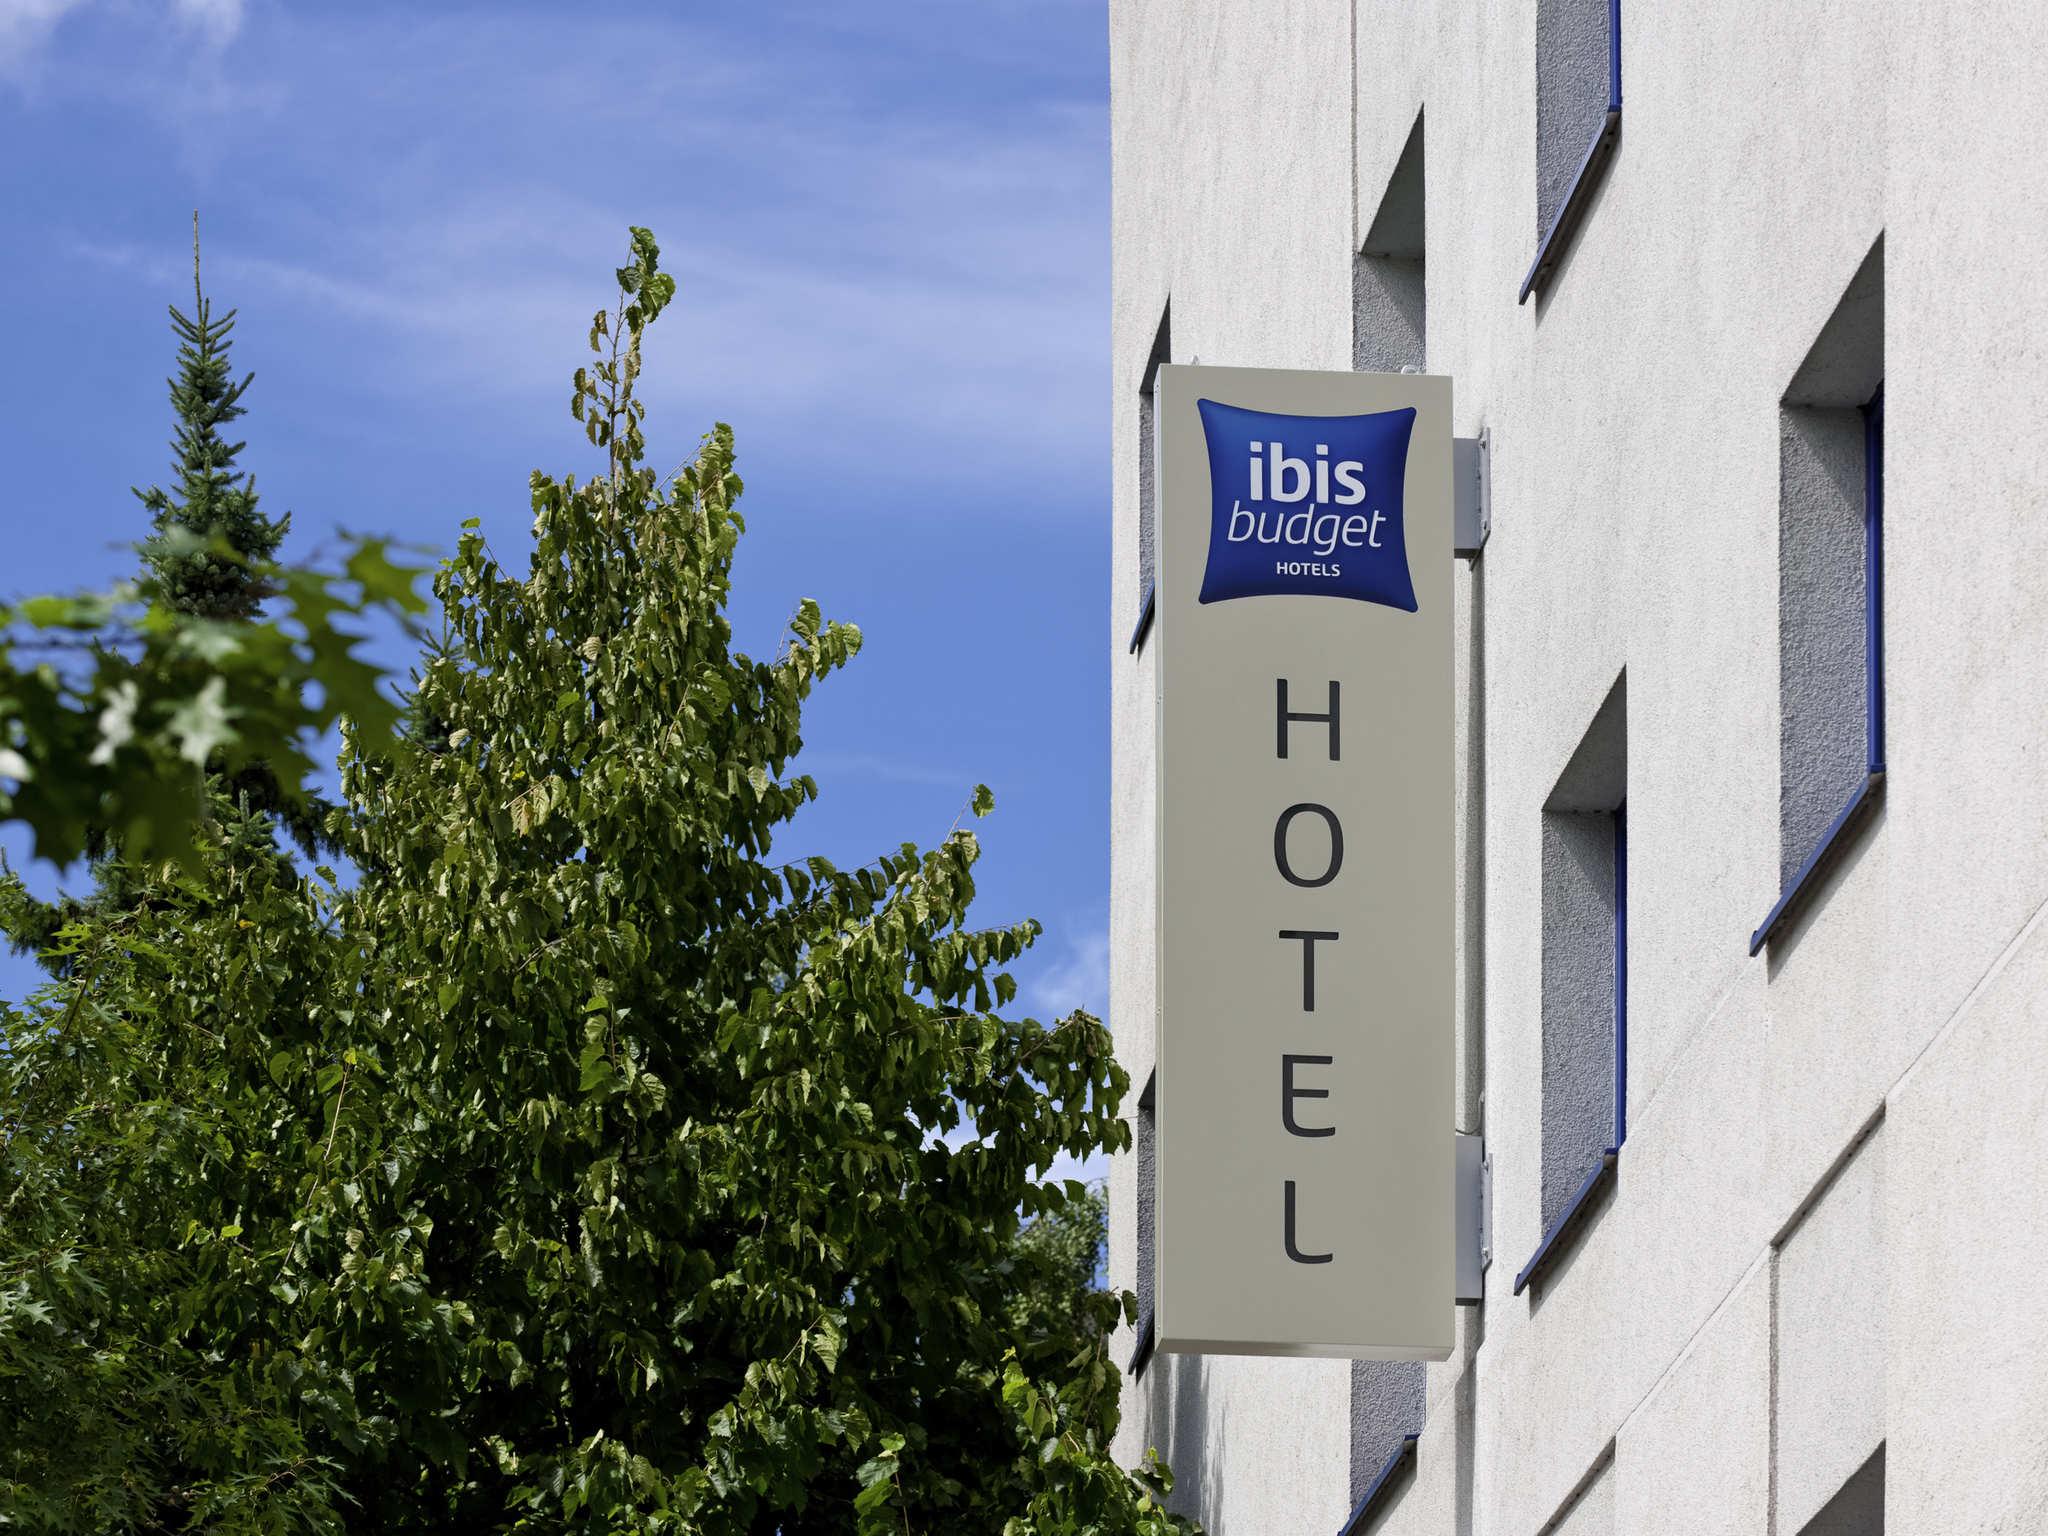 فندق - إيبيس بدجت ibis budget هامبورغ ألتونا